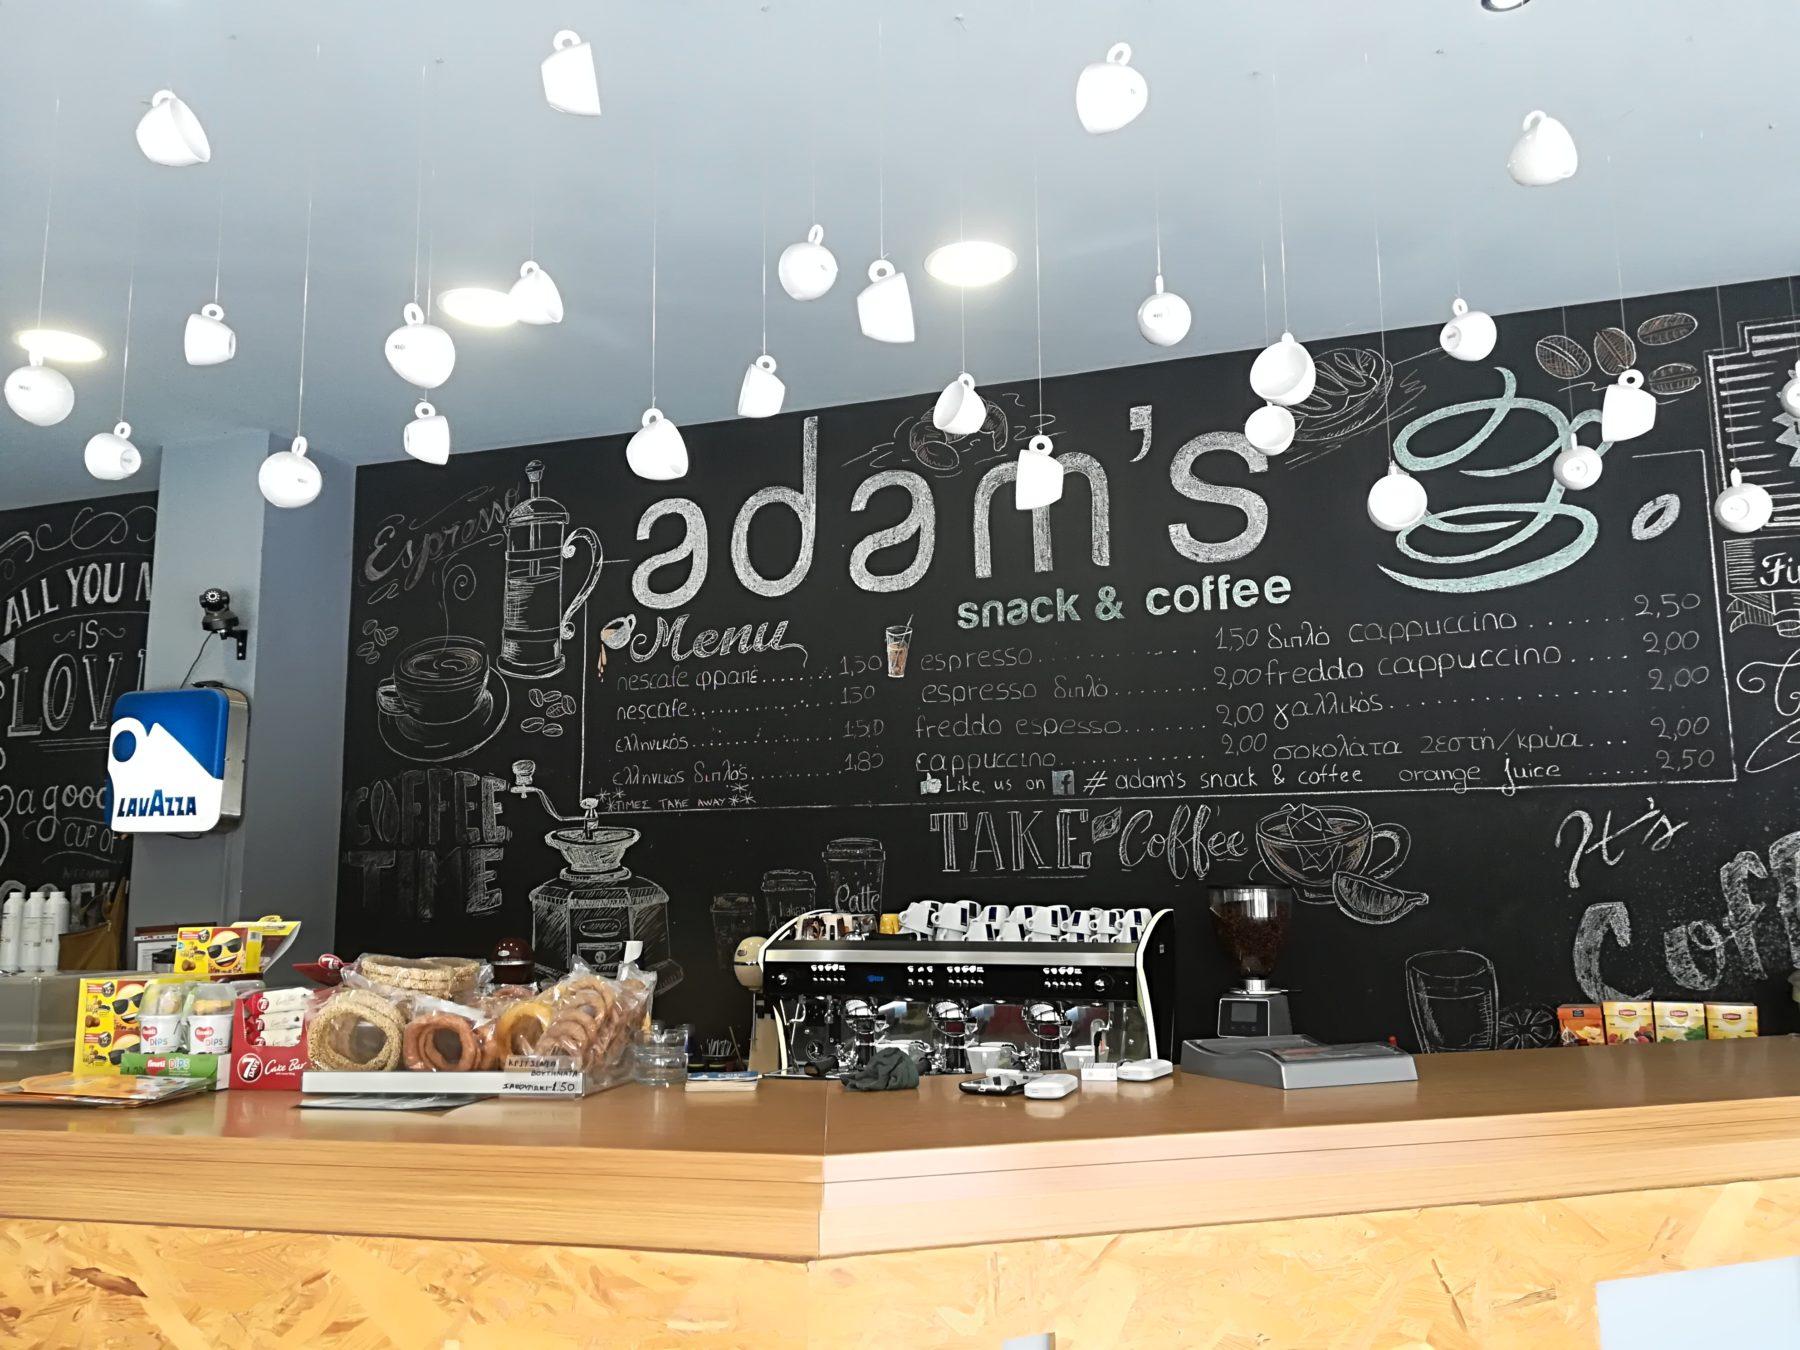 Adam's snack & coffee